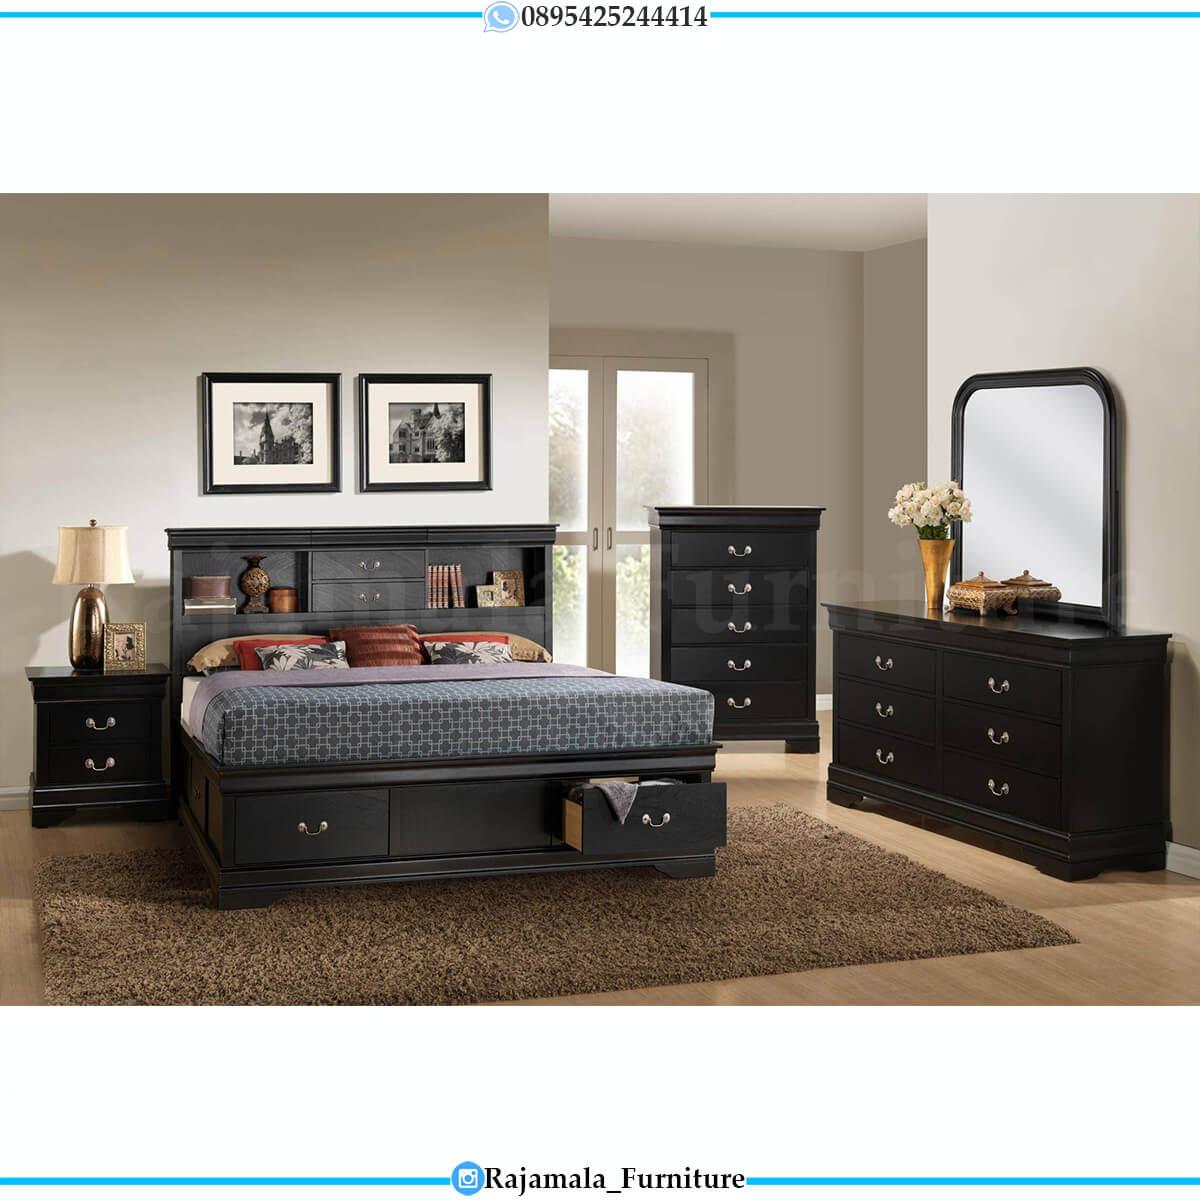 Model Tempat Tidur Minimalis Duco Simple Excellent Glossy Color RM-0640